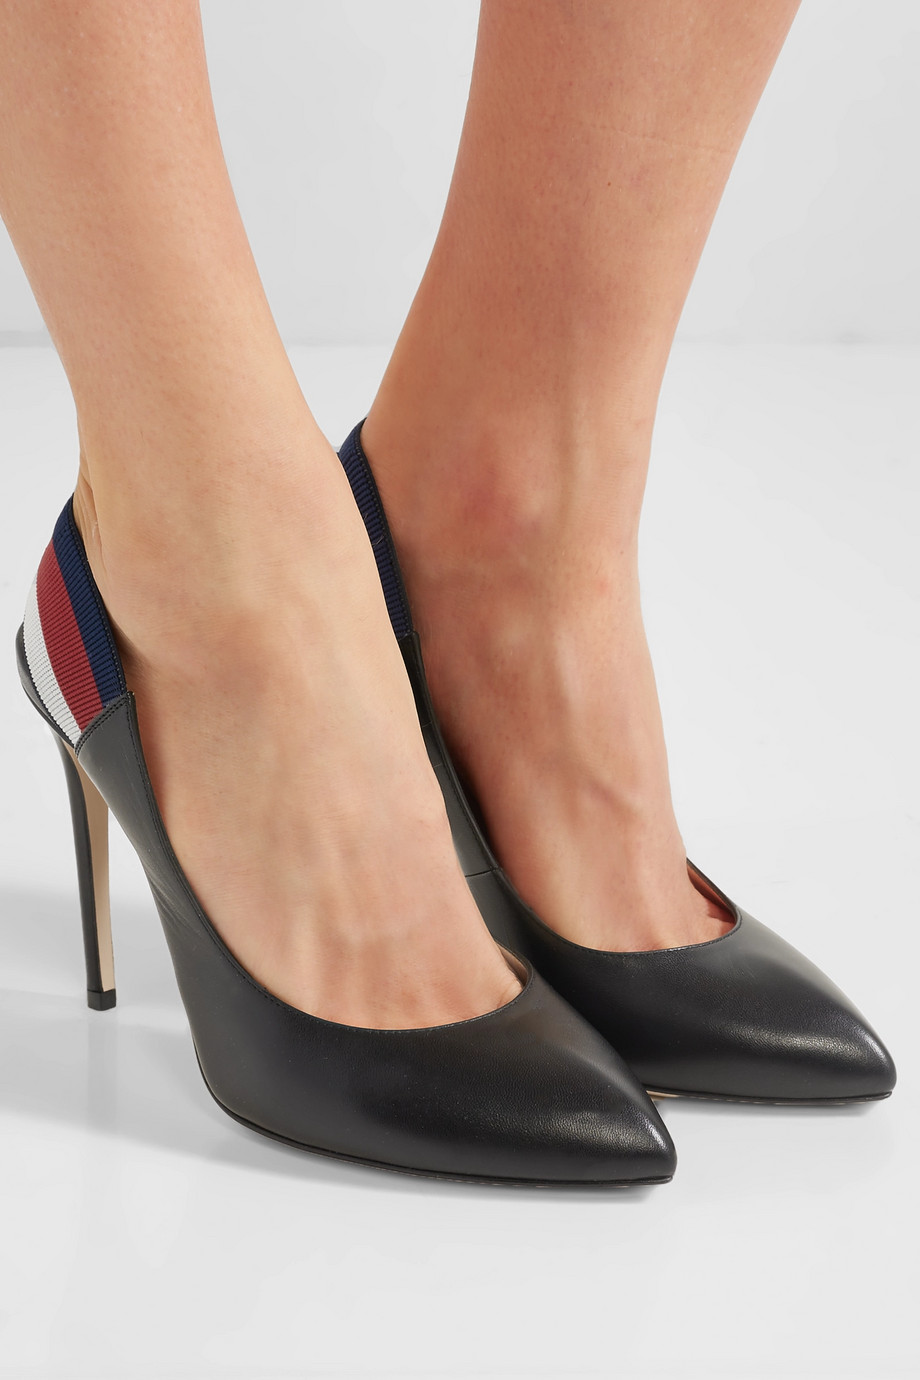 Gucci Sylvie leather slingback pumps